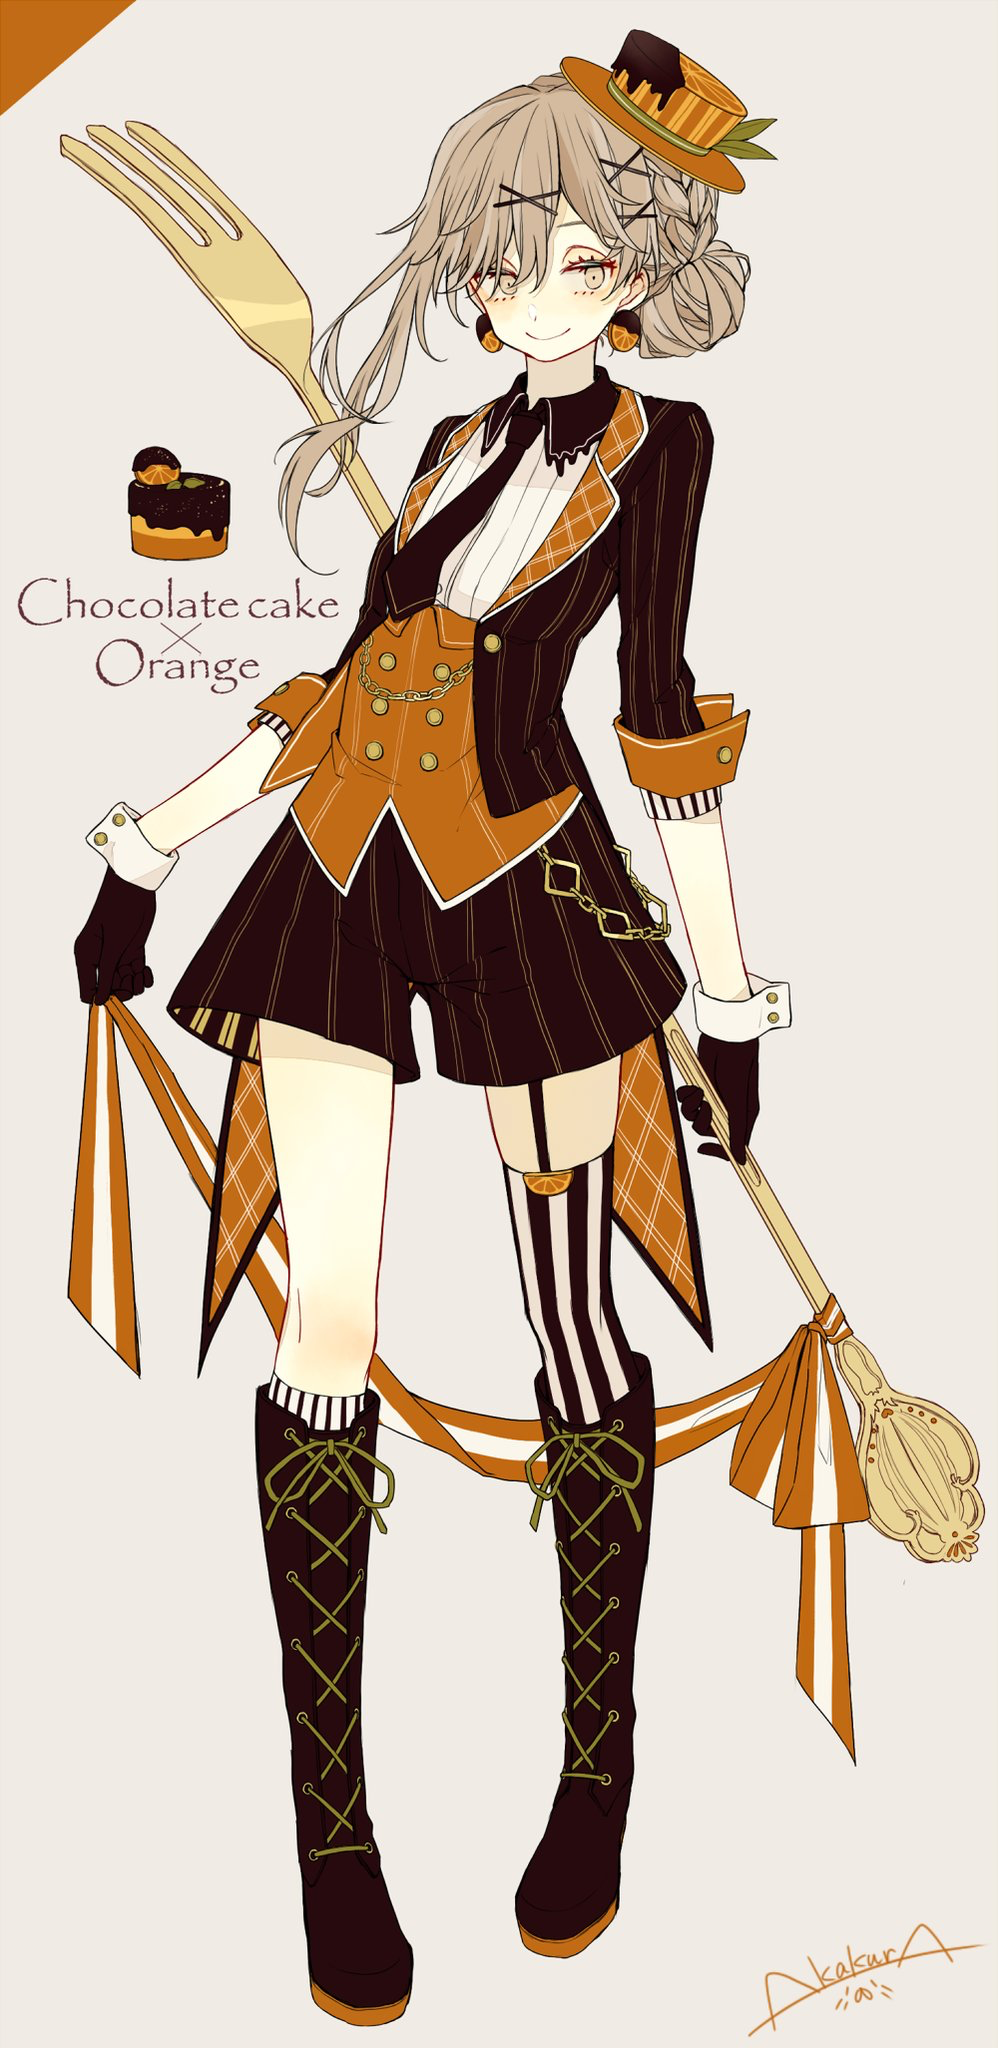 Pinterest Exlxisa Character Design アニメイラスト